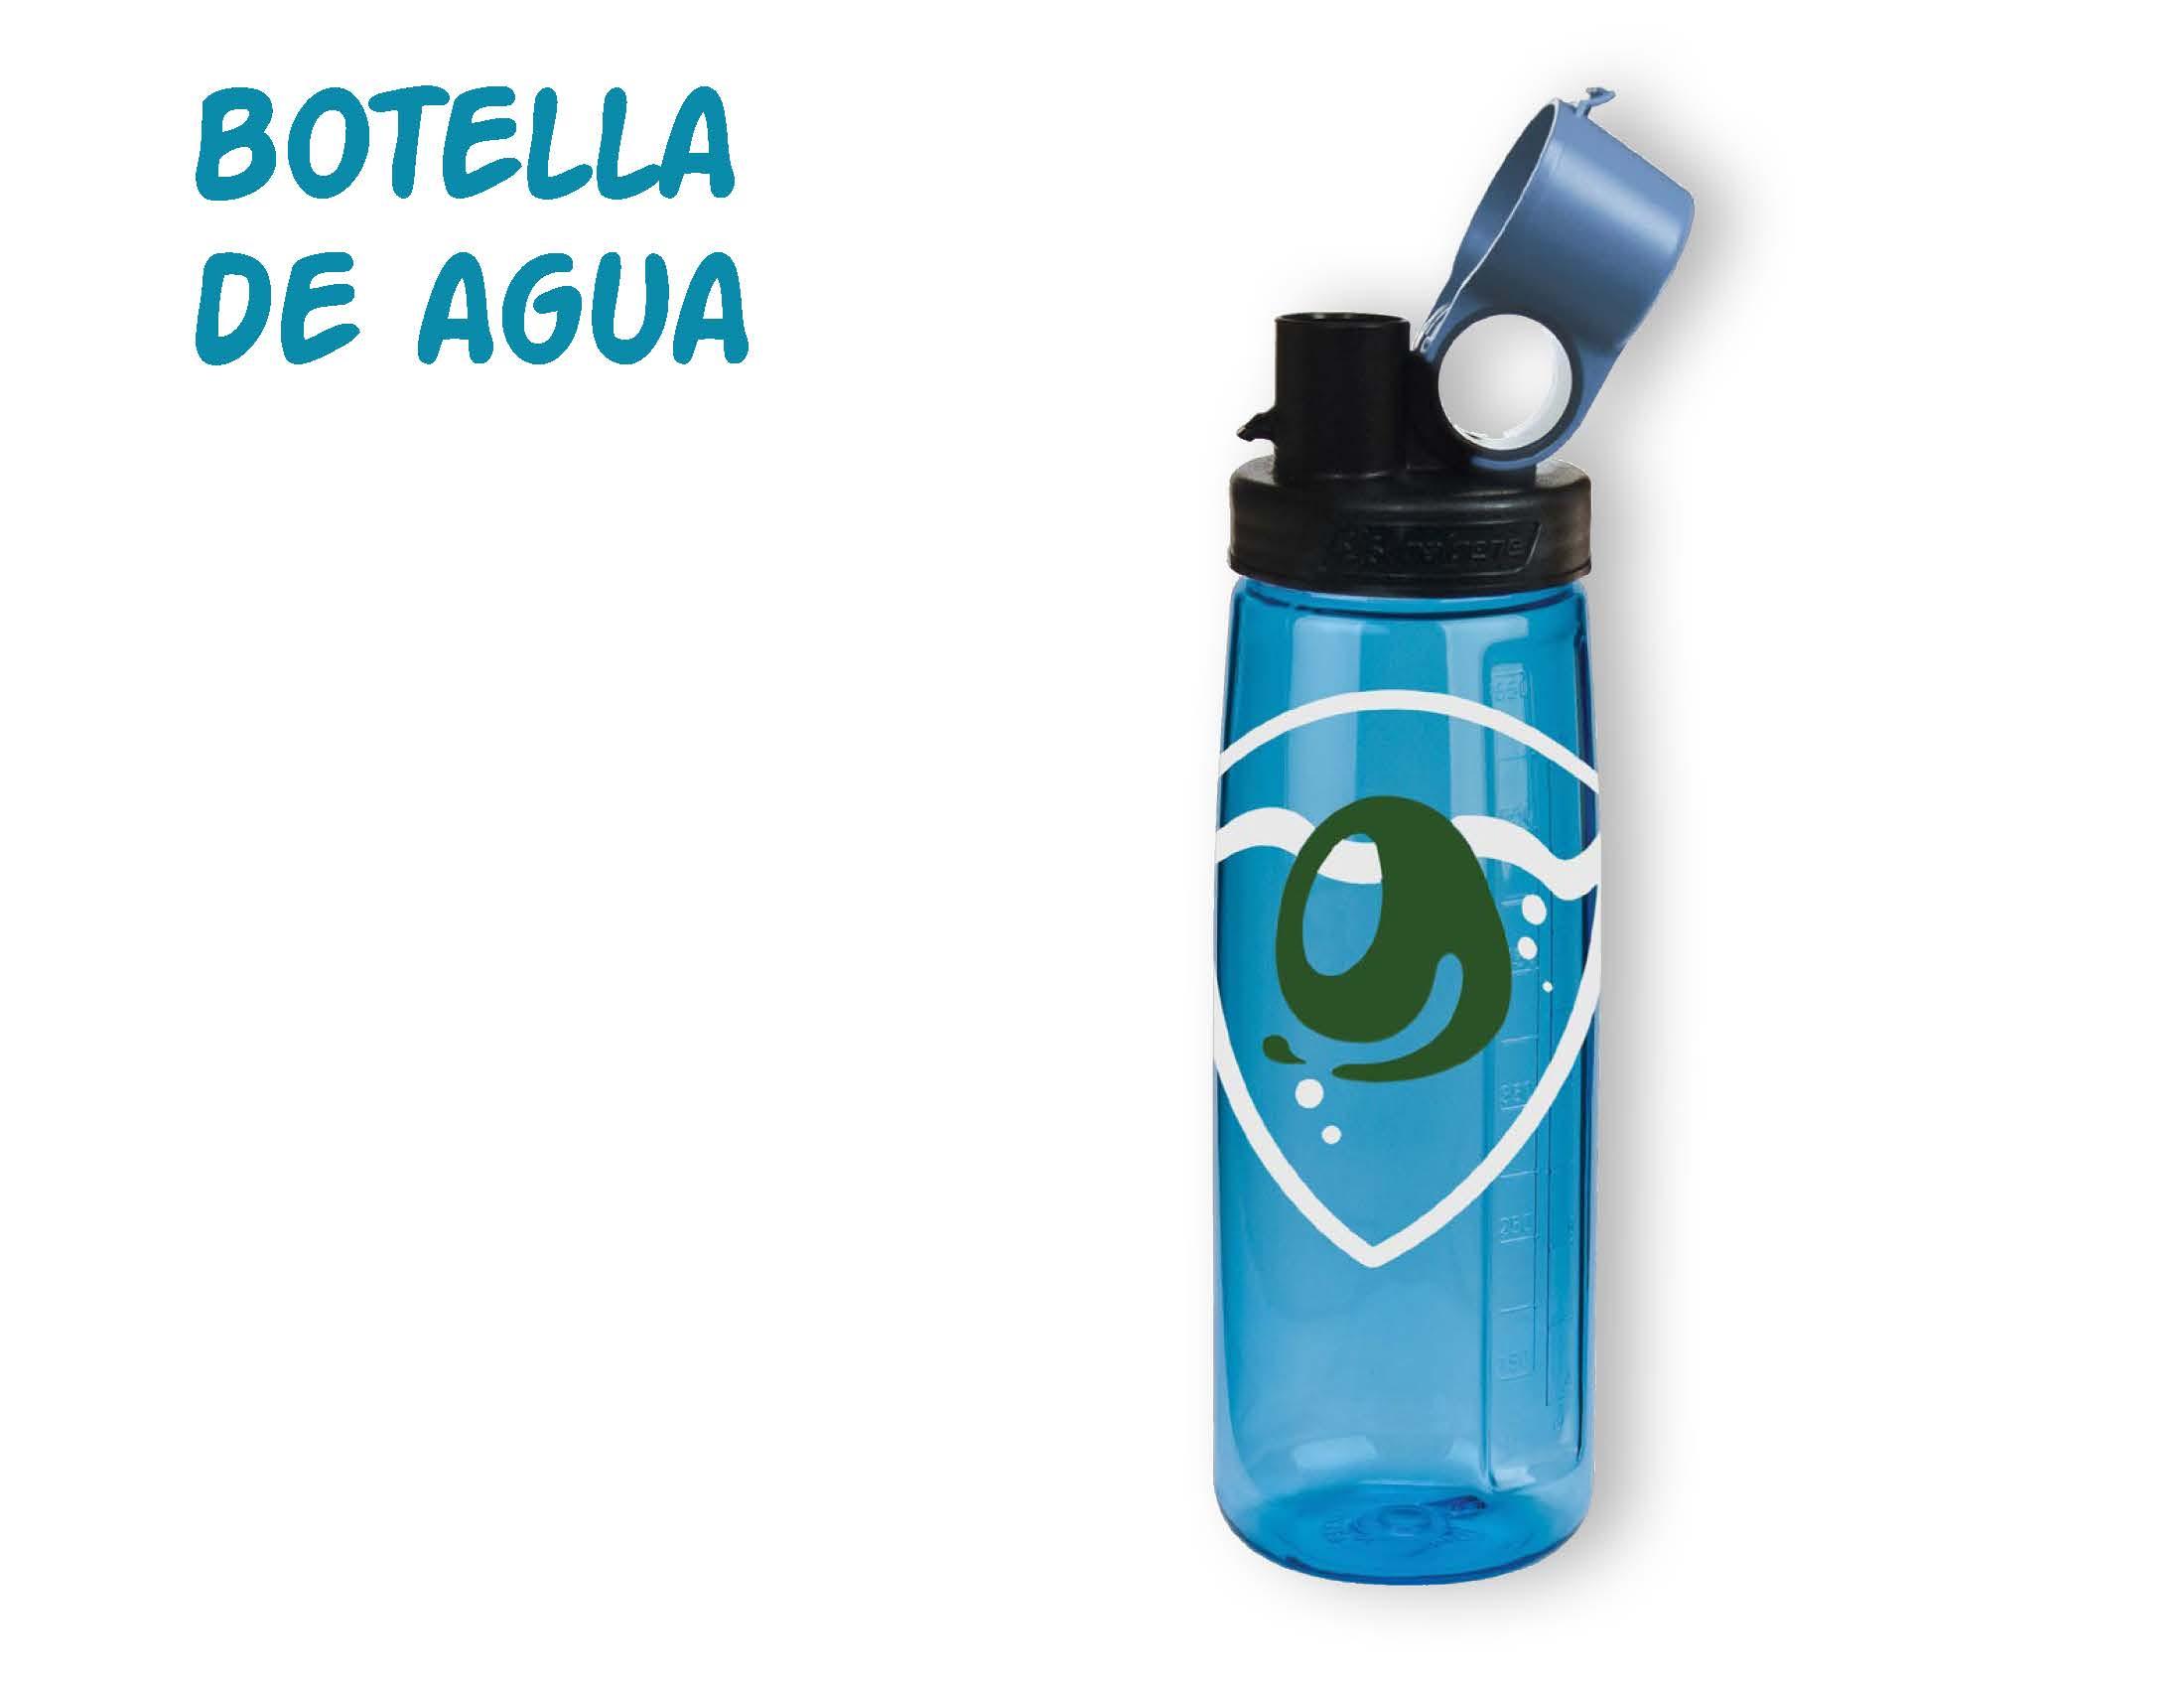 aguatemala_presentation.v2_Page_19.jpg